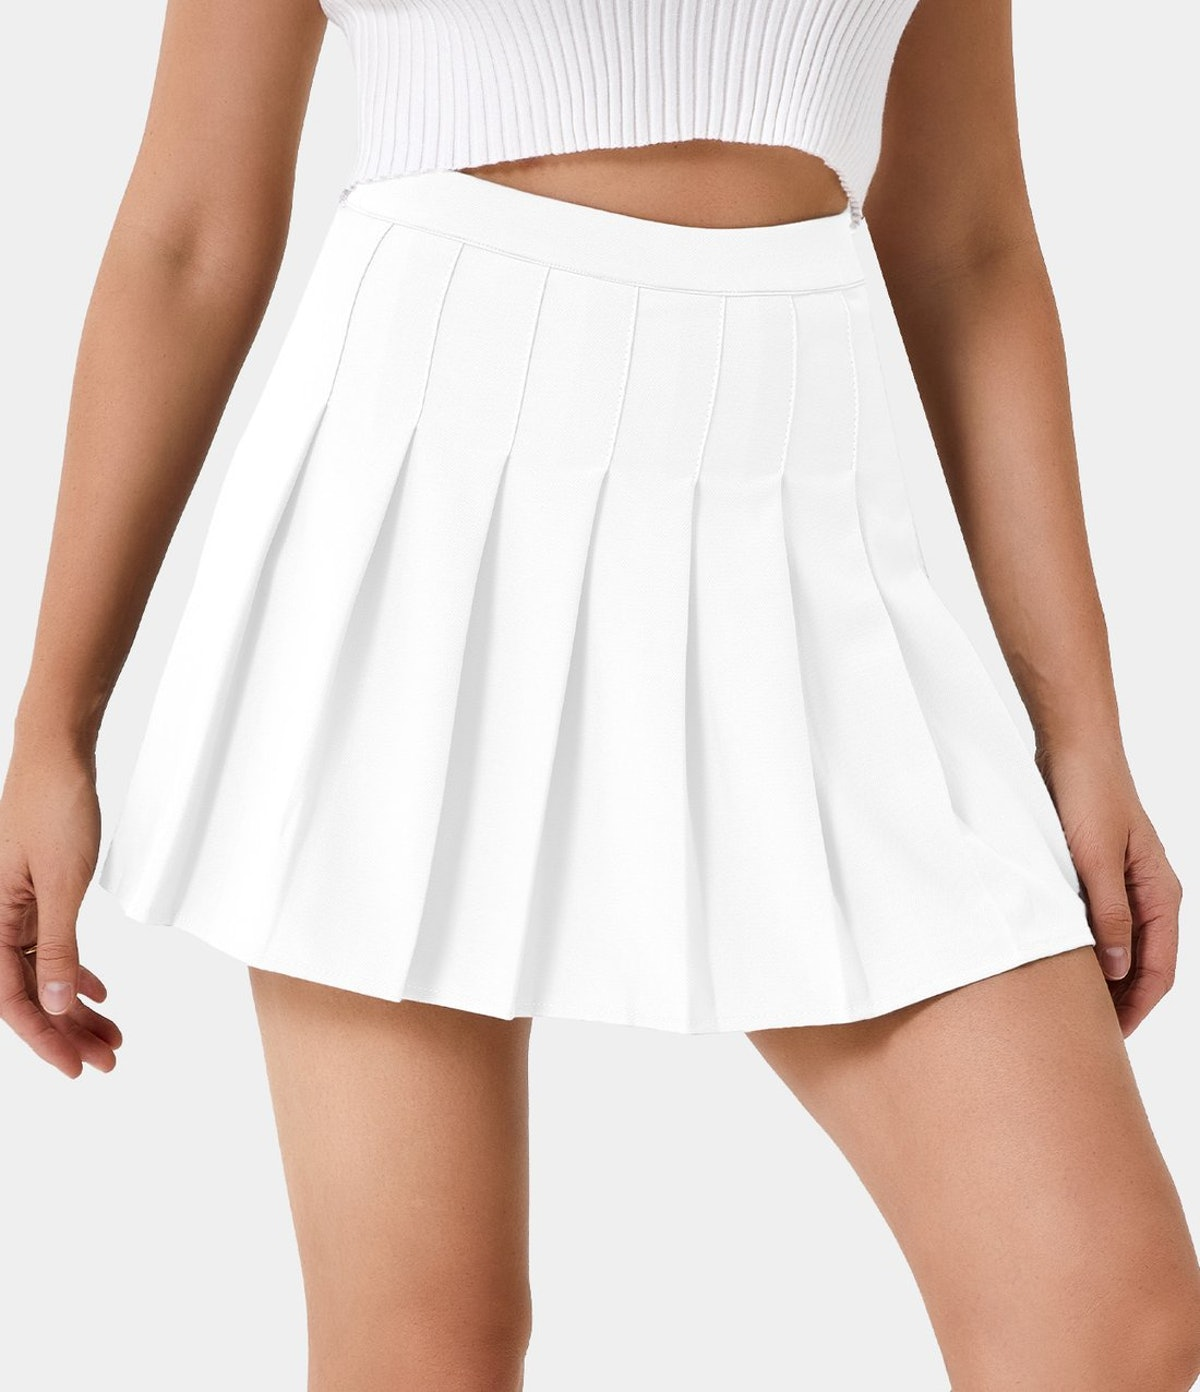 Everyday 2-in-1 Tennis Skirt-Siren